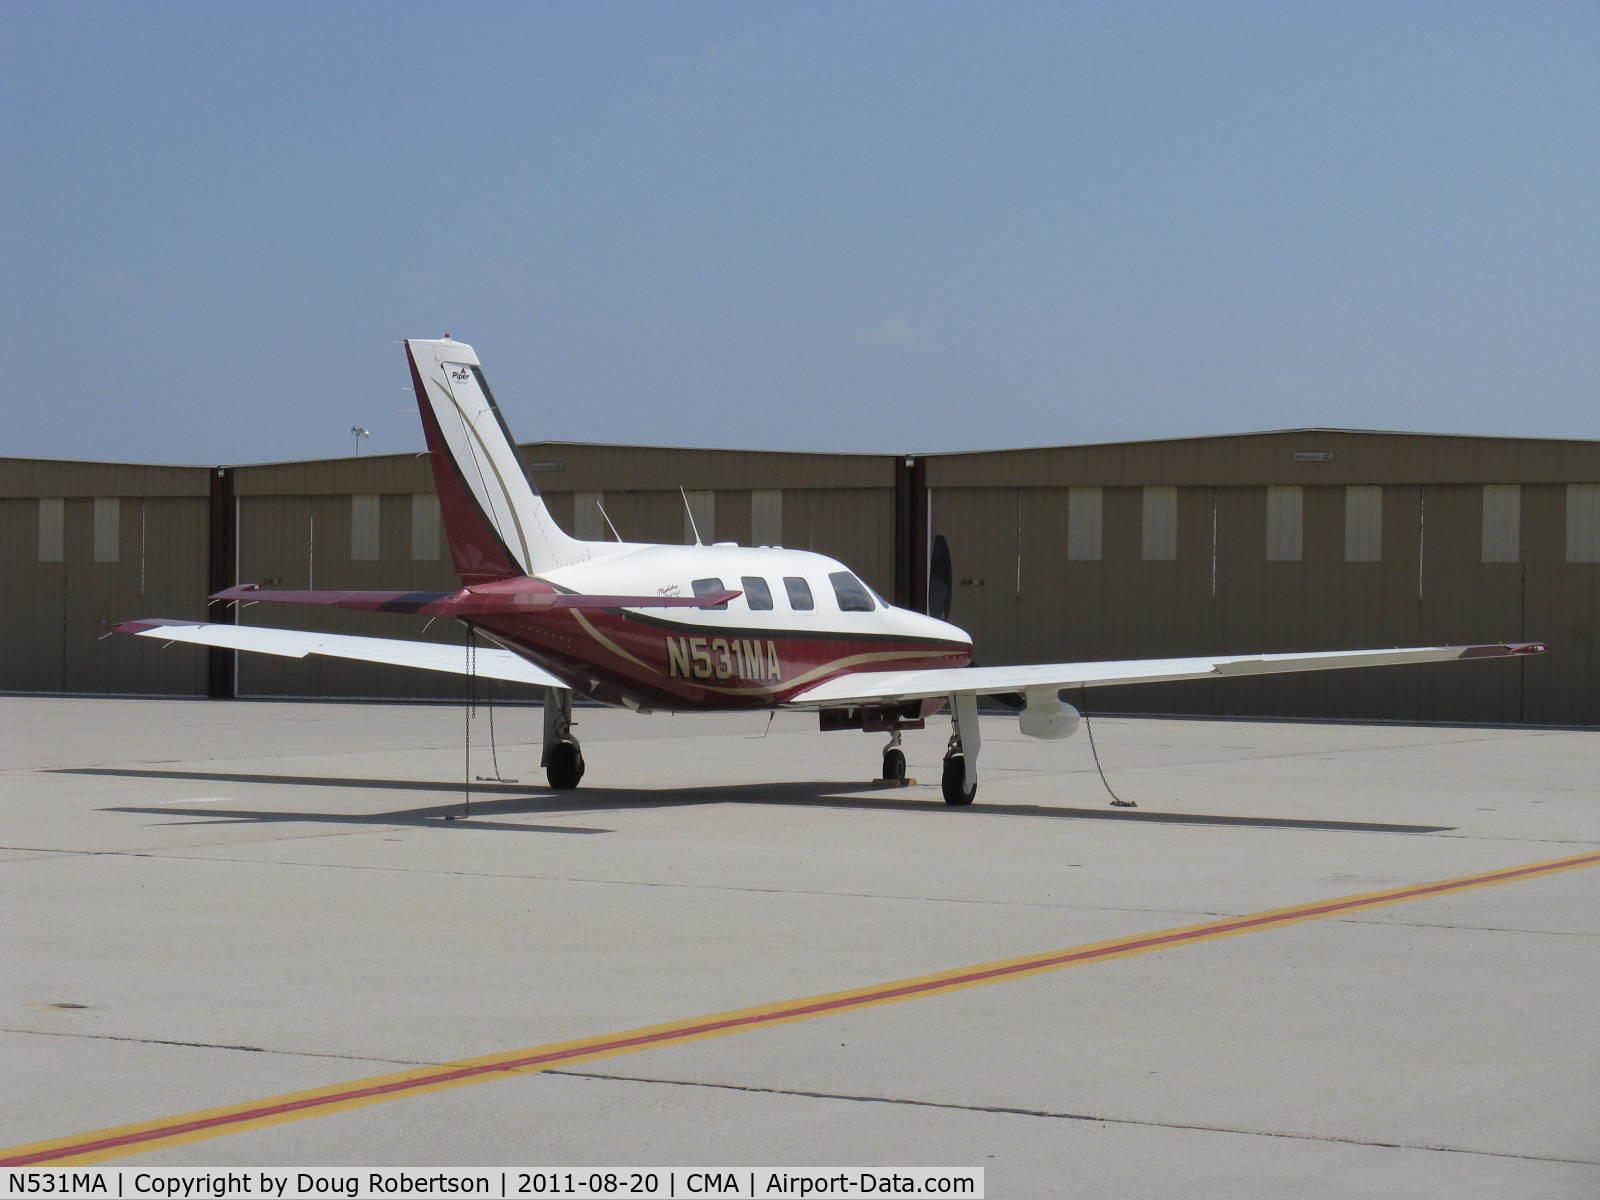 Aircraft N531ma 2002 Piper Pa 46 350p Malibu Mirage C N